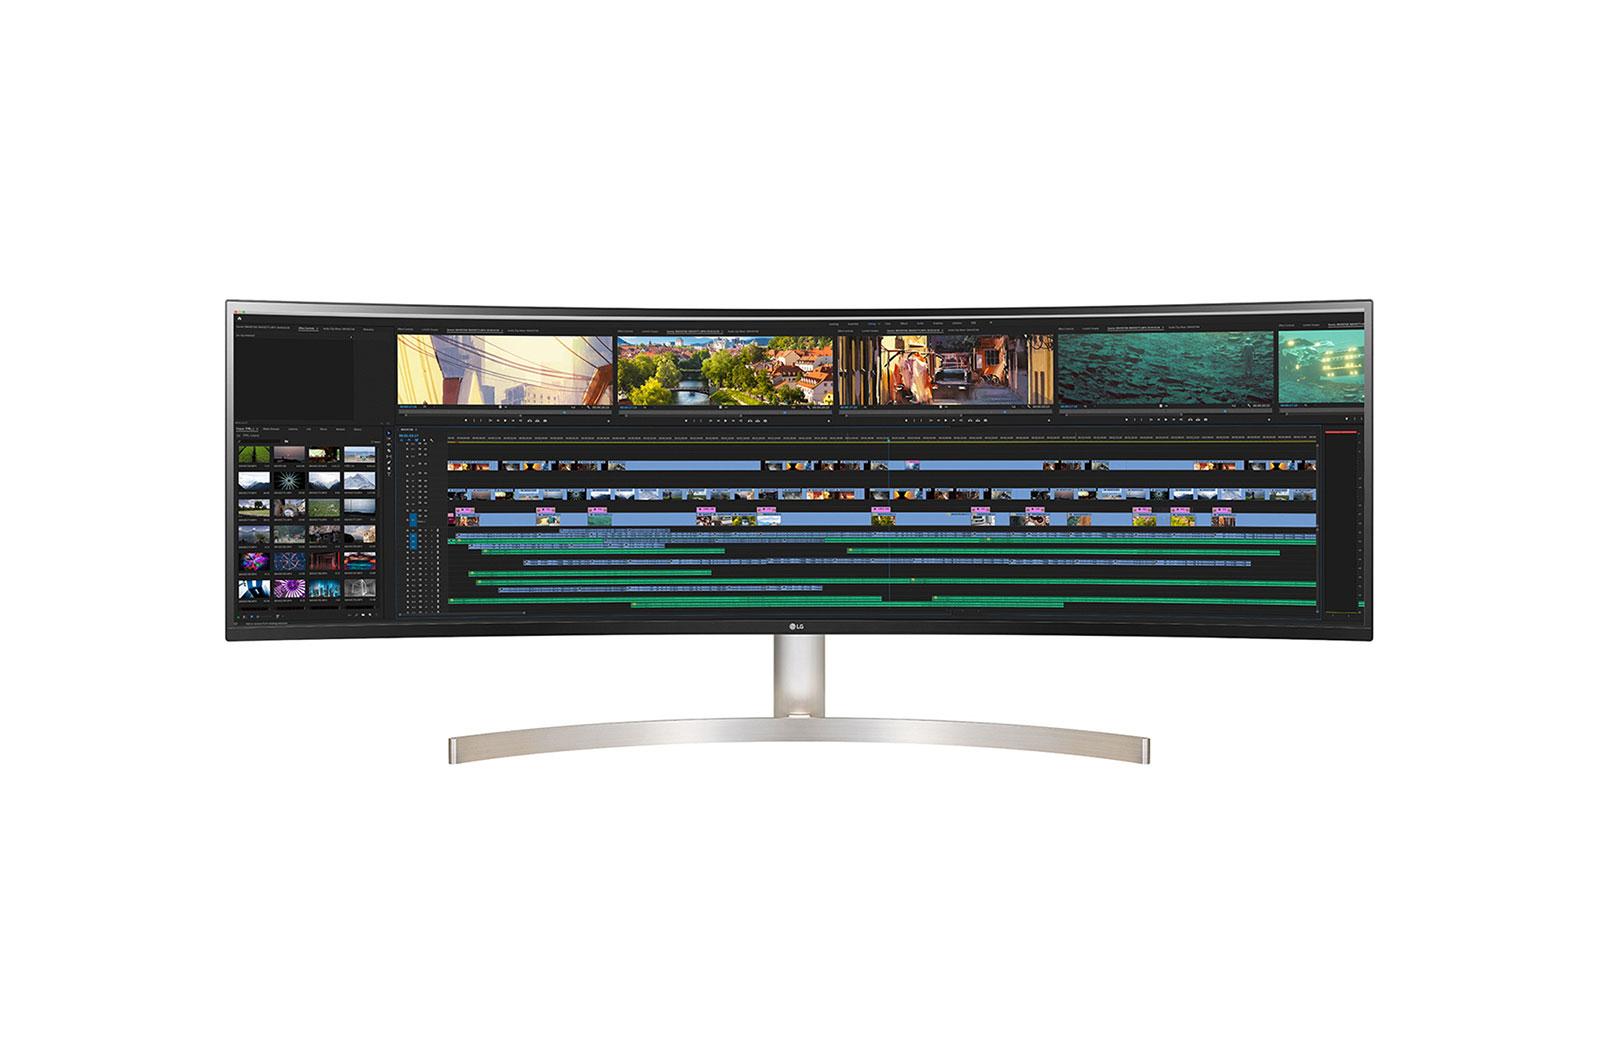 LG 49WL95C LED display 124.5 cm (49